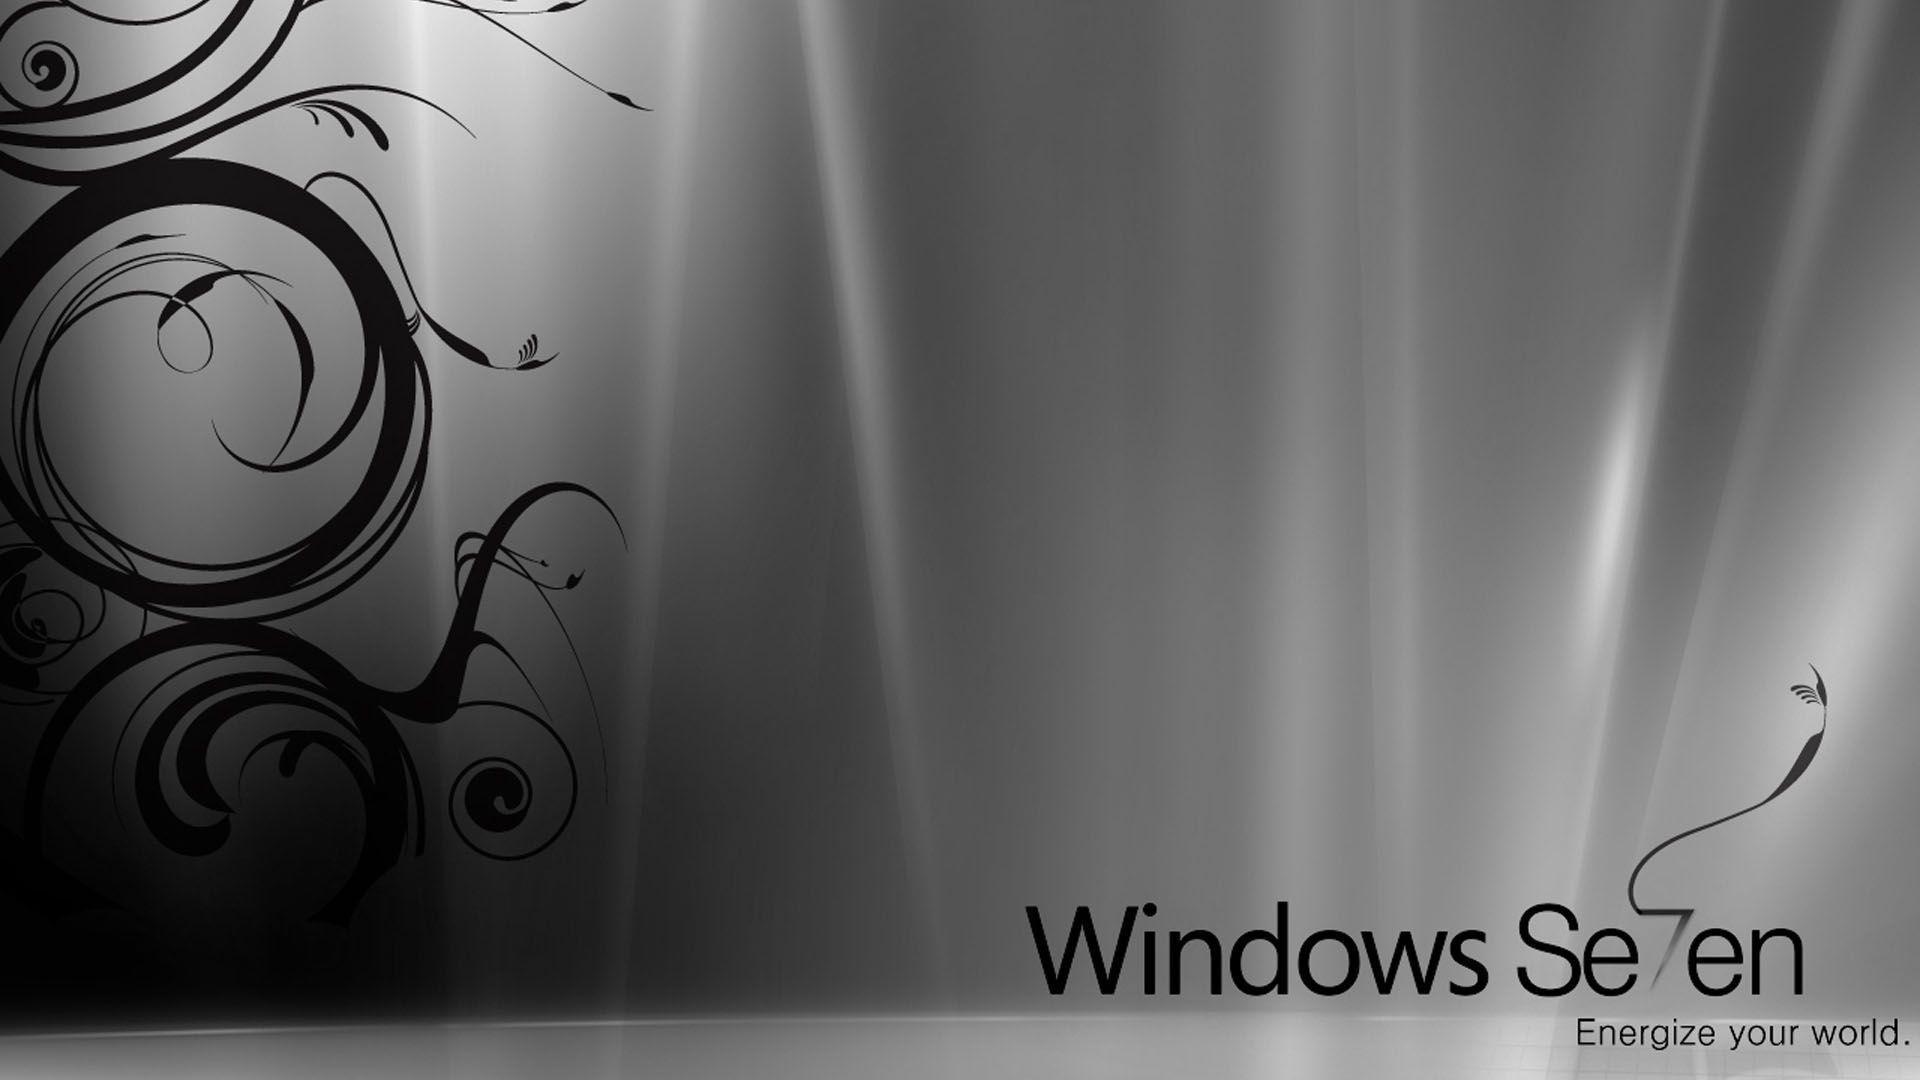 Black Windows Wallpaper 1080p: Windows 7 HD Wallpapers 1080p